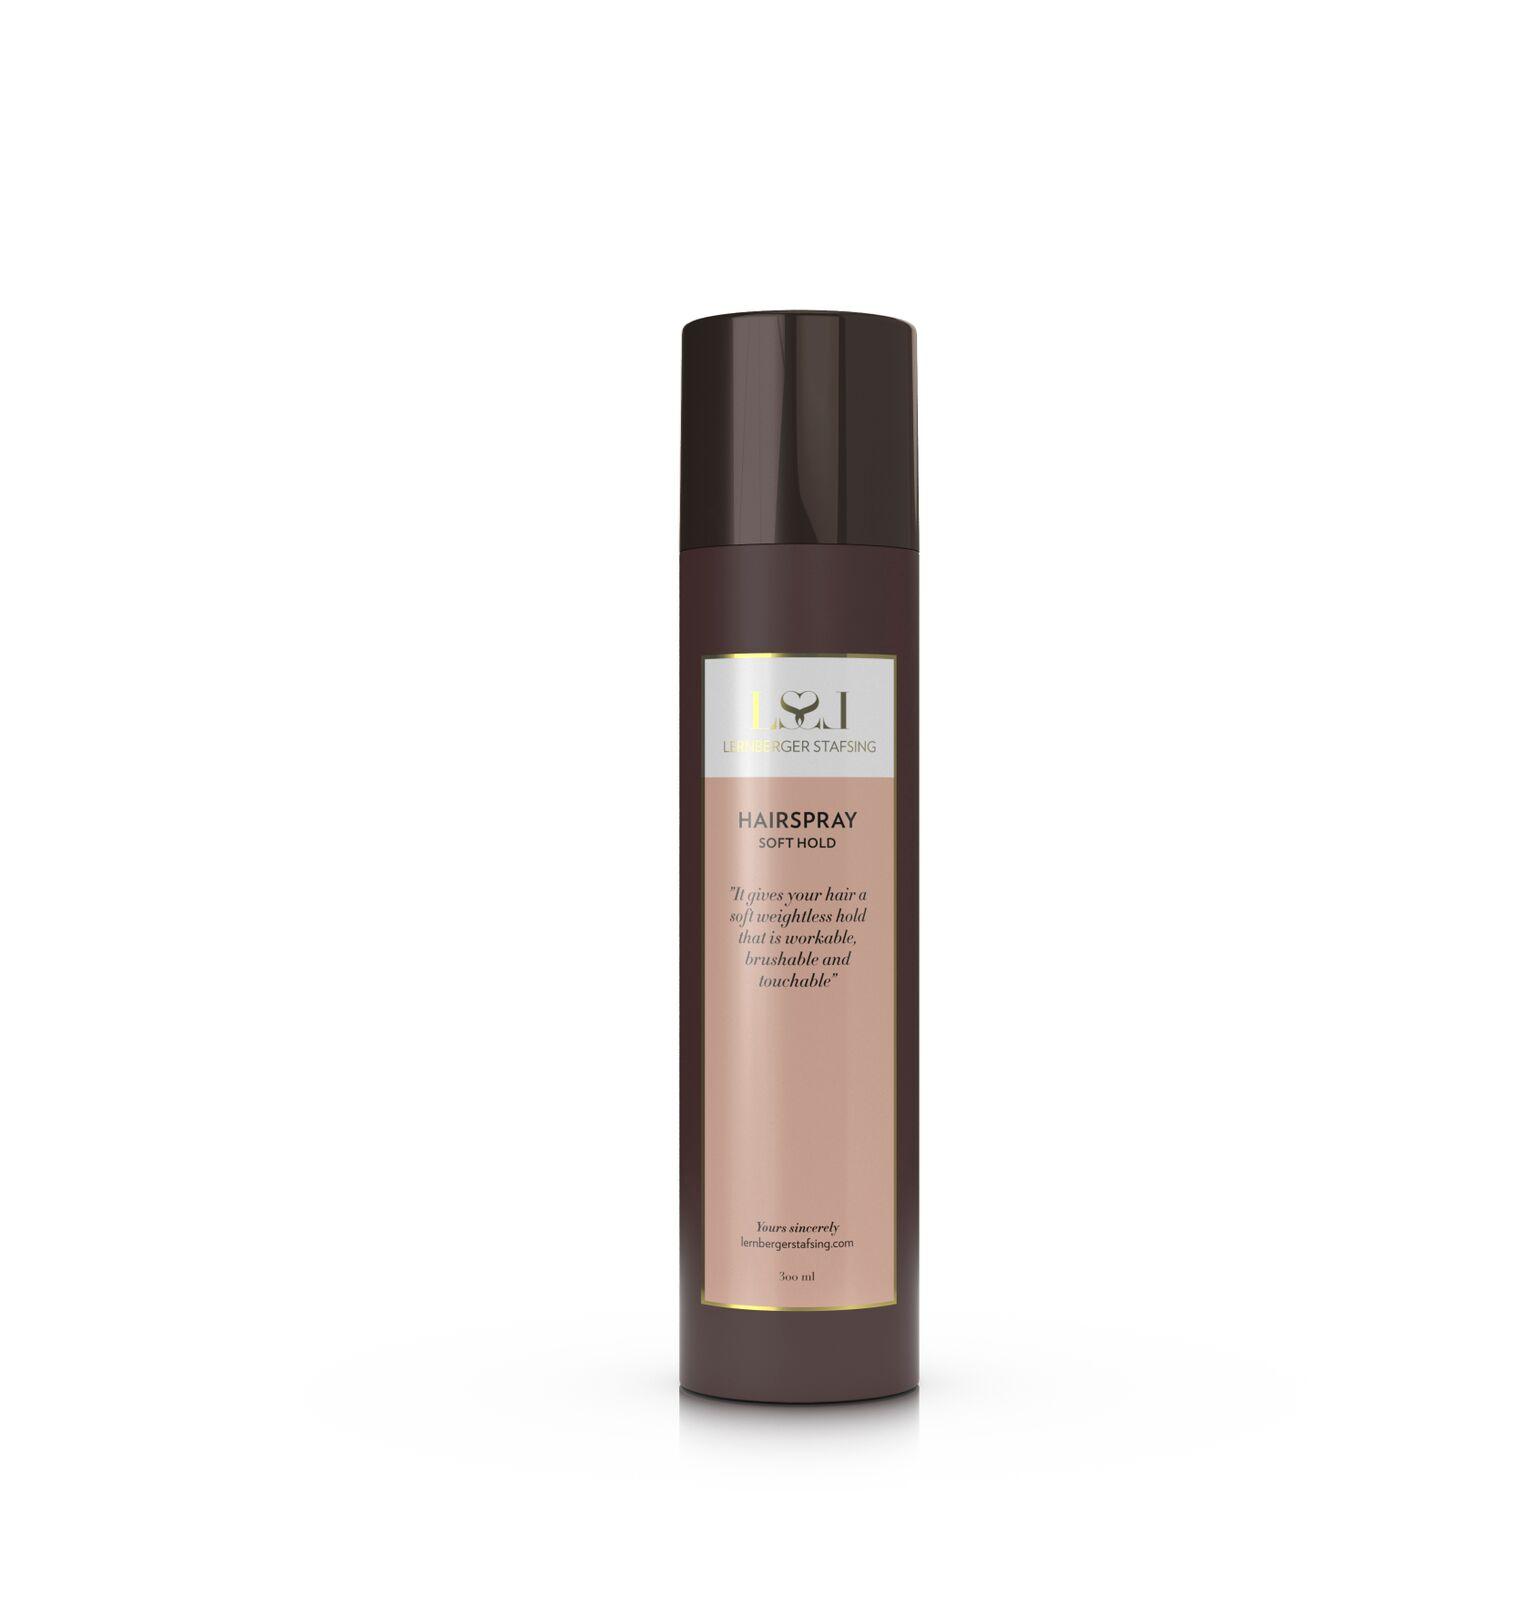 Lernberger Stafsing Soft Hold Hairspray, 300 ml